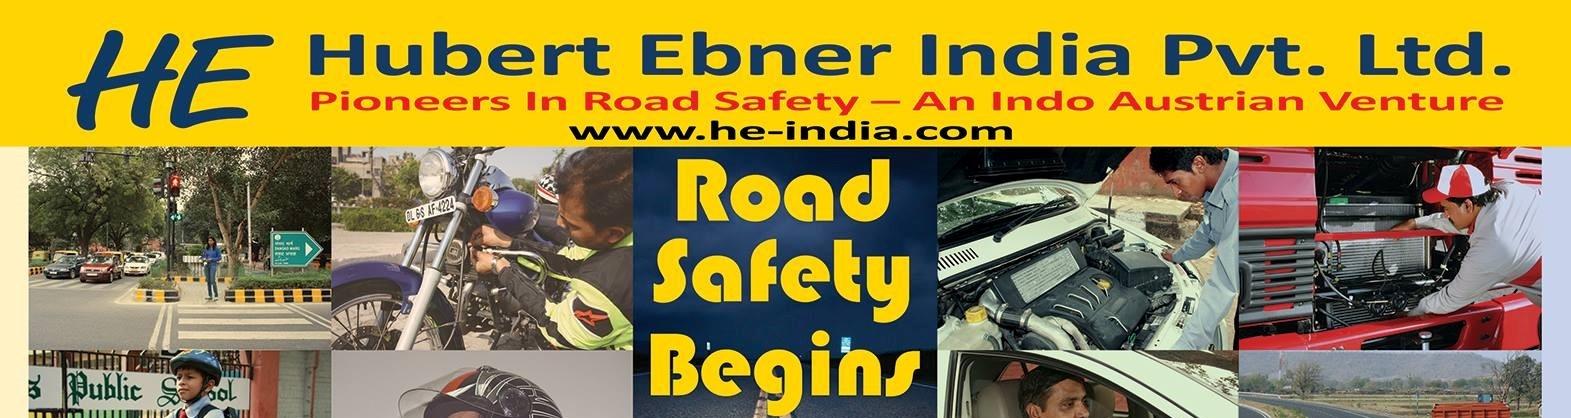 Hubert Ebner (India) Pvt. Ltd. (@heindia) Cover Image